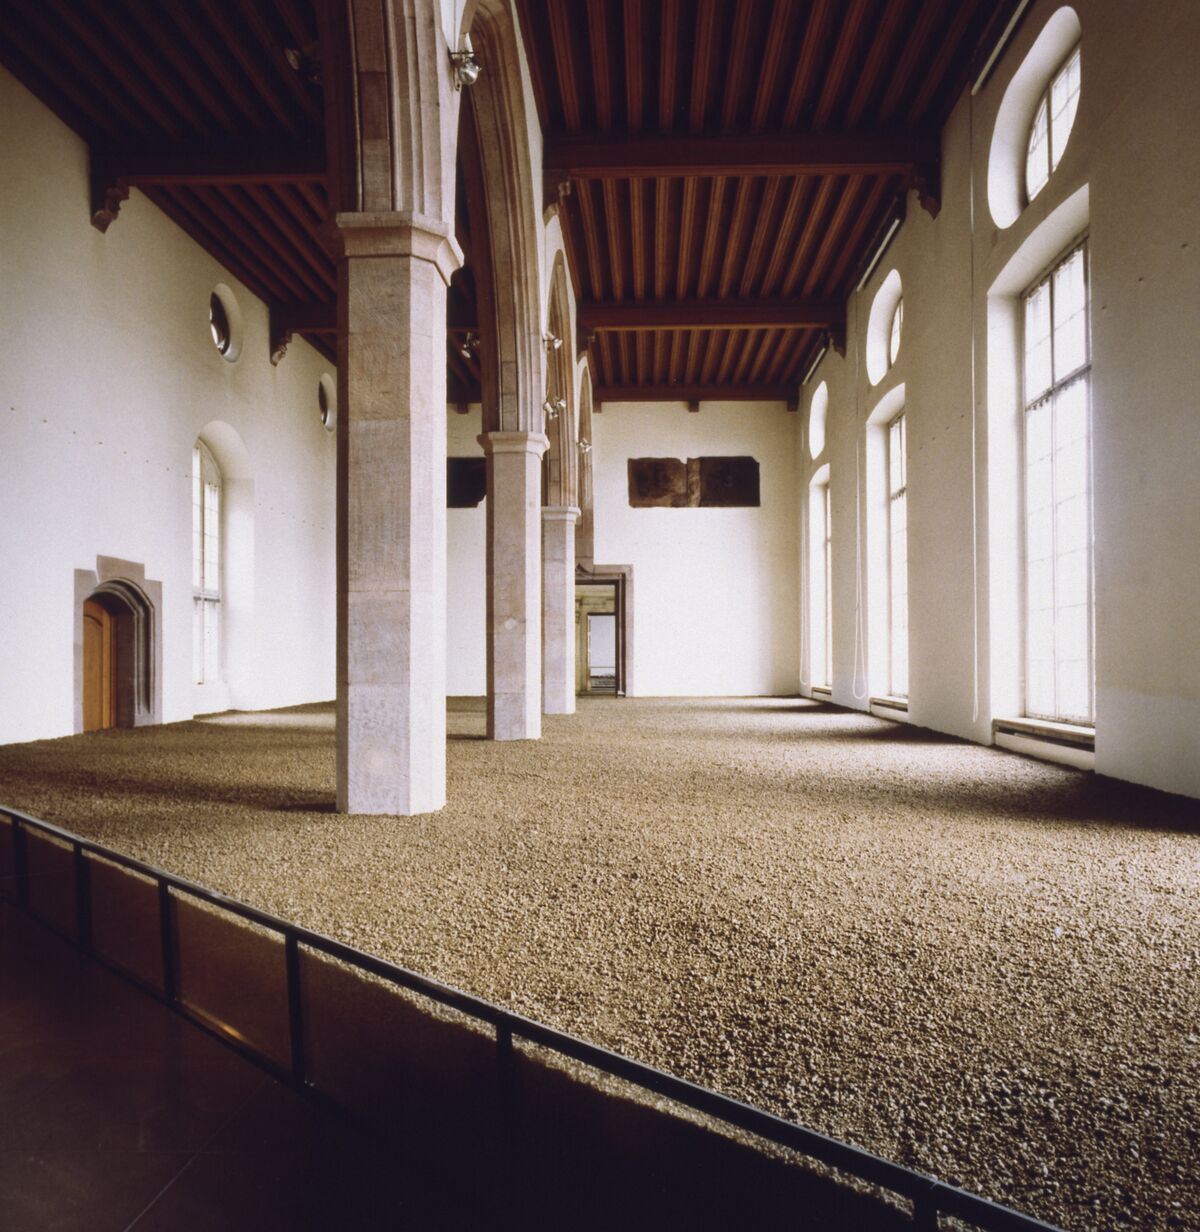 Walter De Maria, Darmstadt Earth Room, 1974. Photo by Timm Rautert. © The Estate of Walter De Maria. Courtesy of Dia Art Foundation.